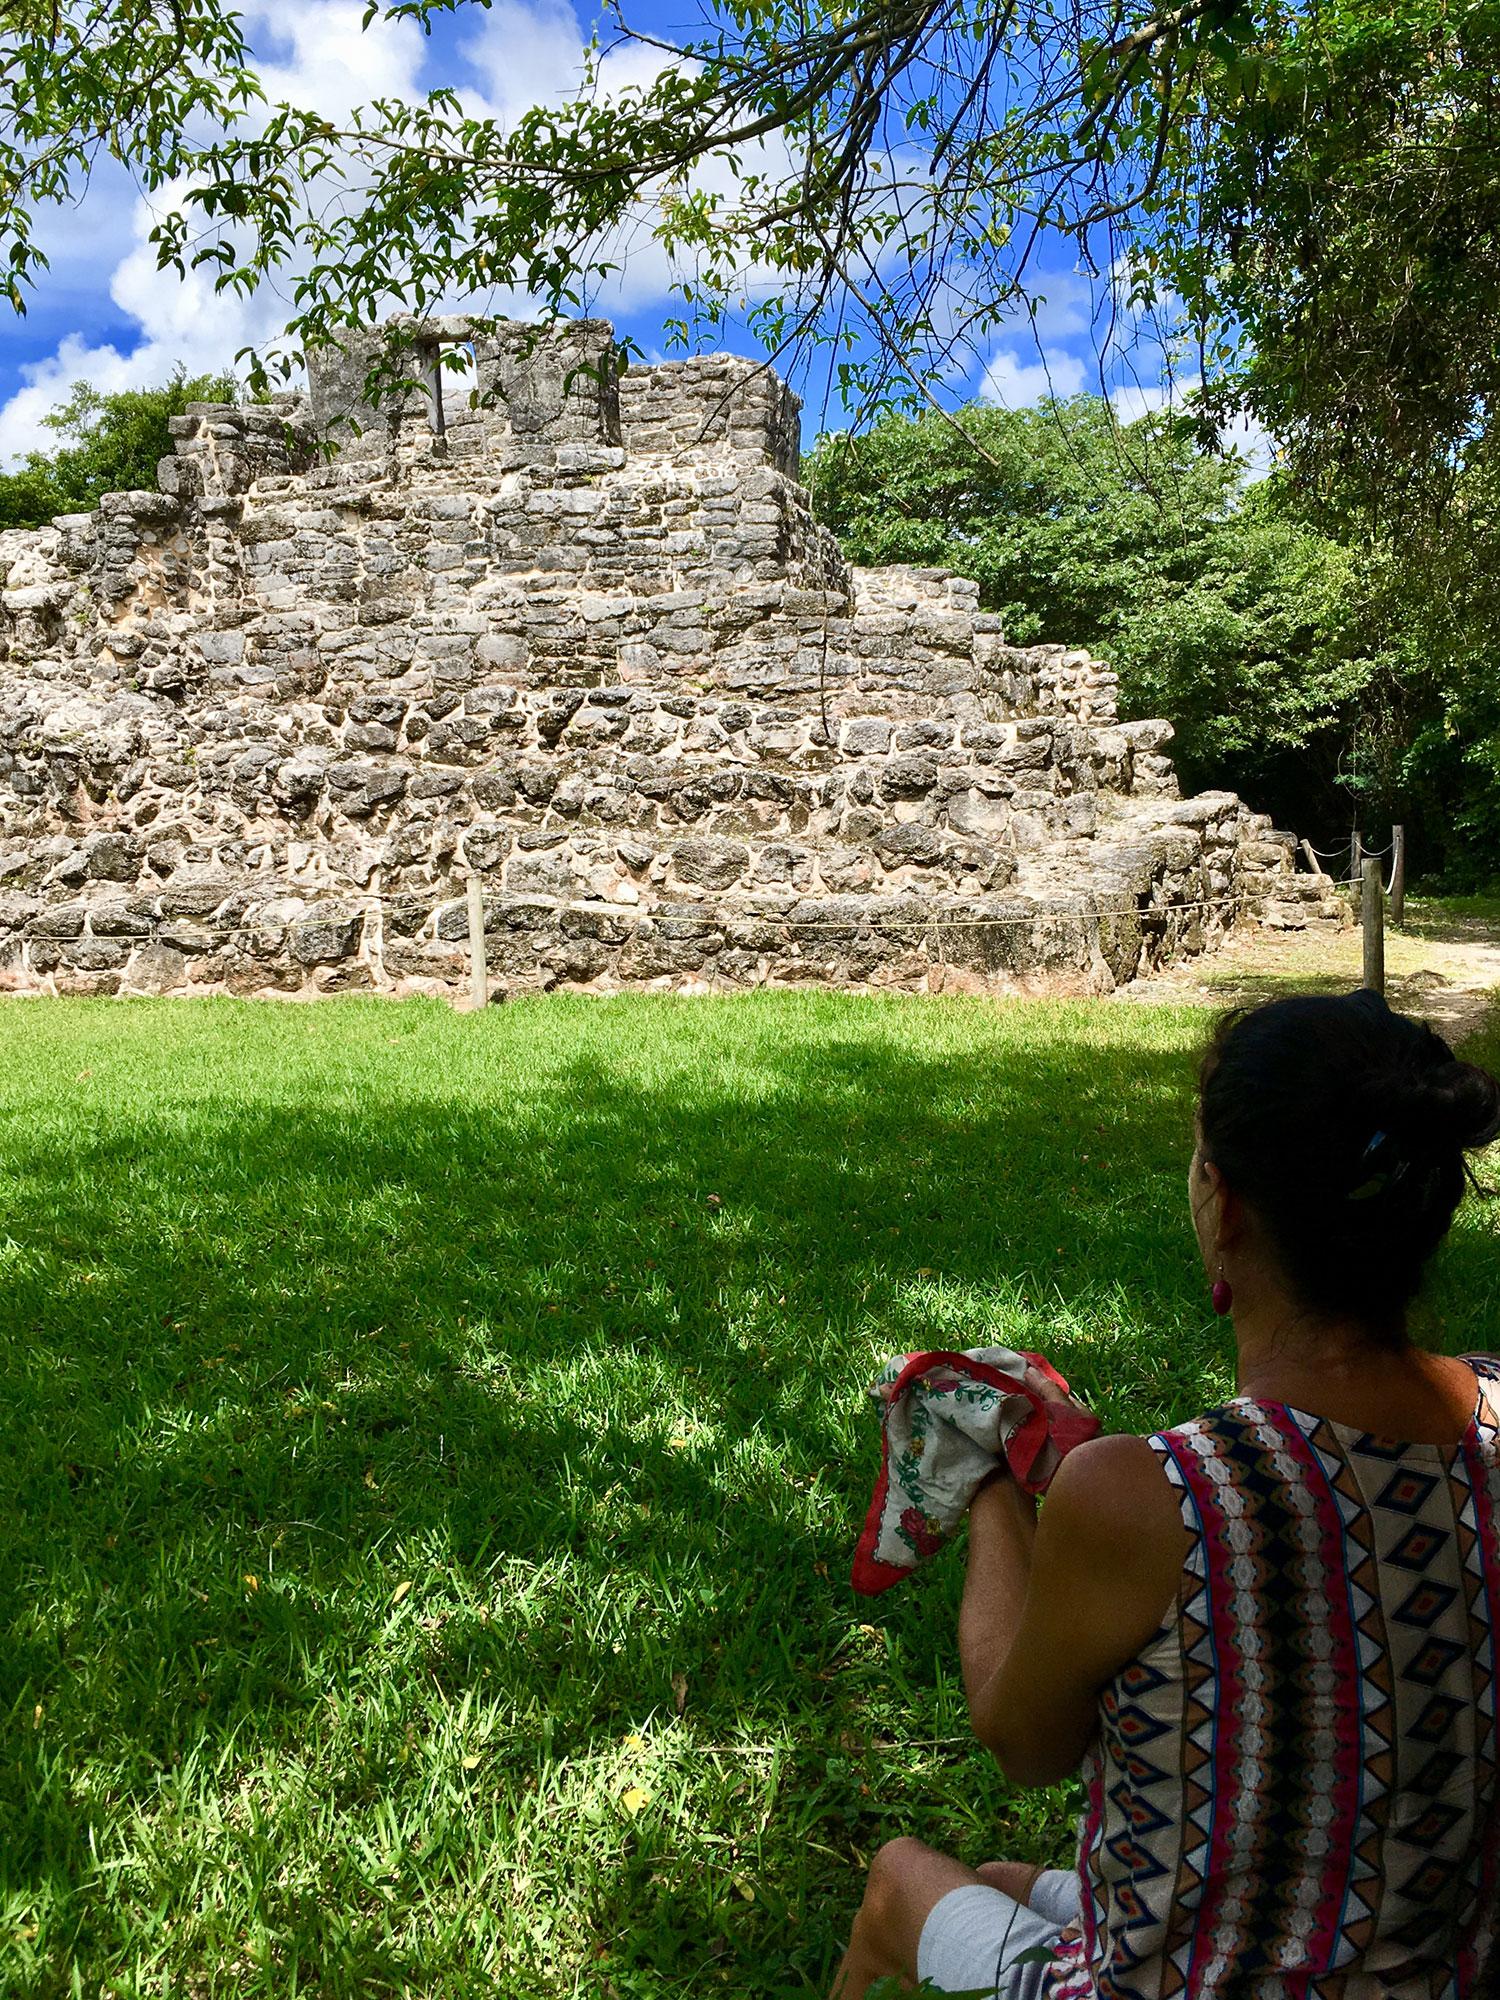 Hammocks_and_Ruins_What_to_Do_Mexico_Maya_pramids_San_Gervacio_Cozumel_41.jpg